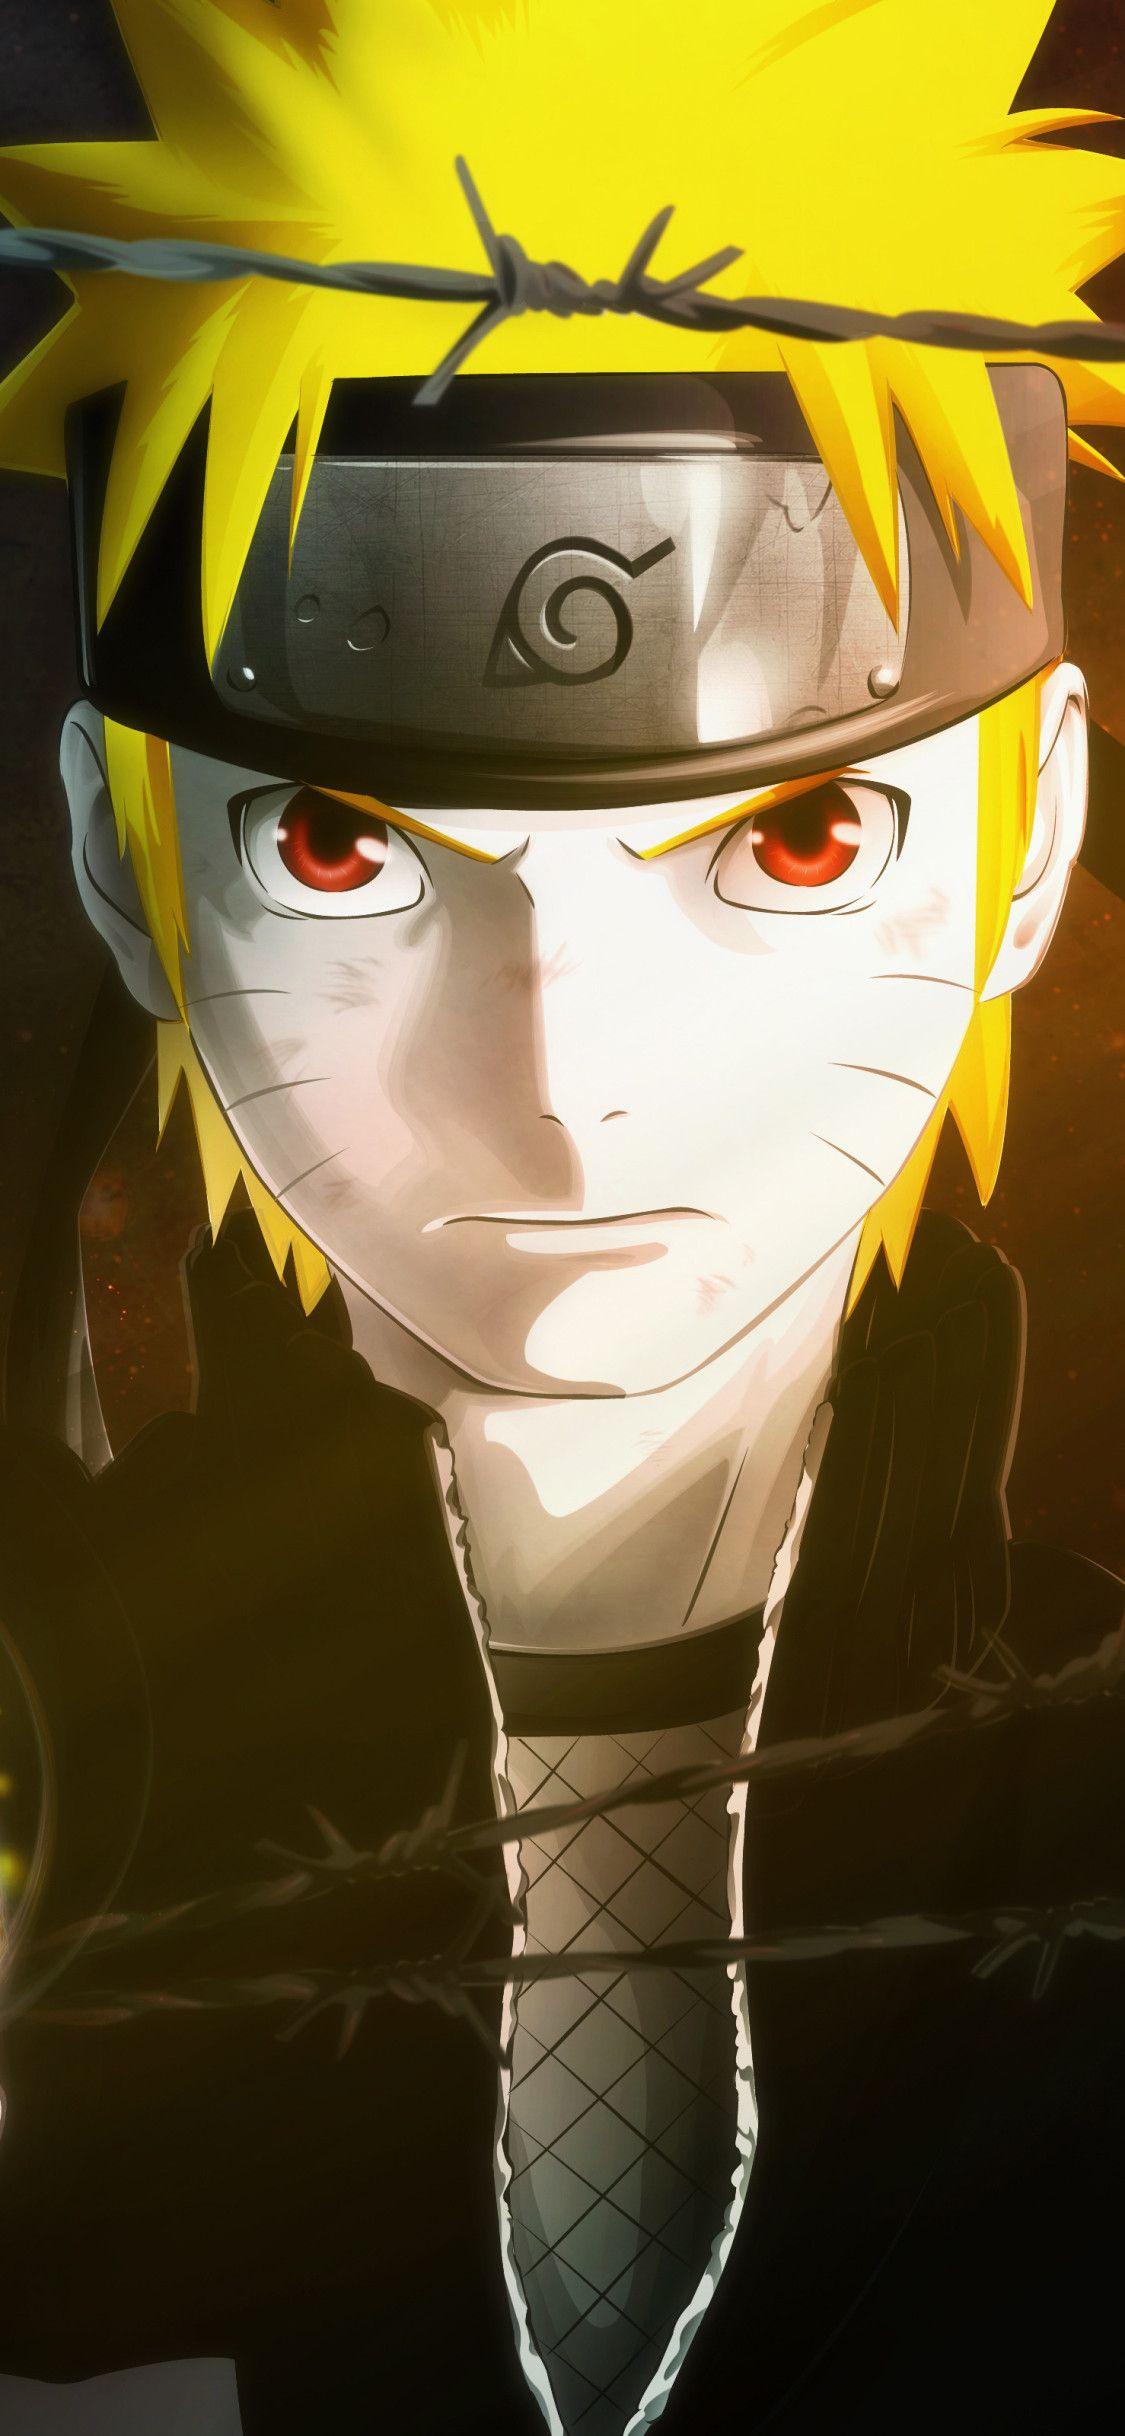 Pin by Lilsemar on Naruto Wallpaper in 2020 Naruto